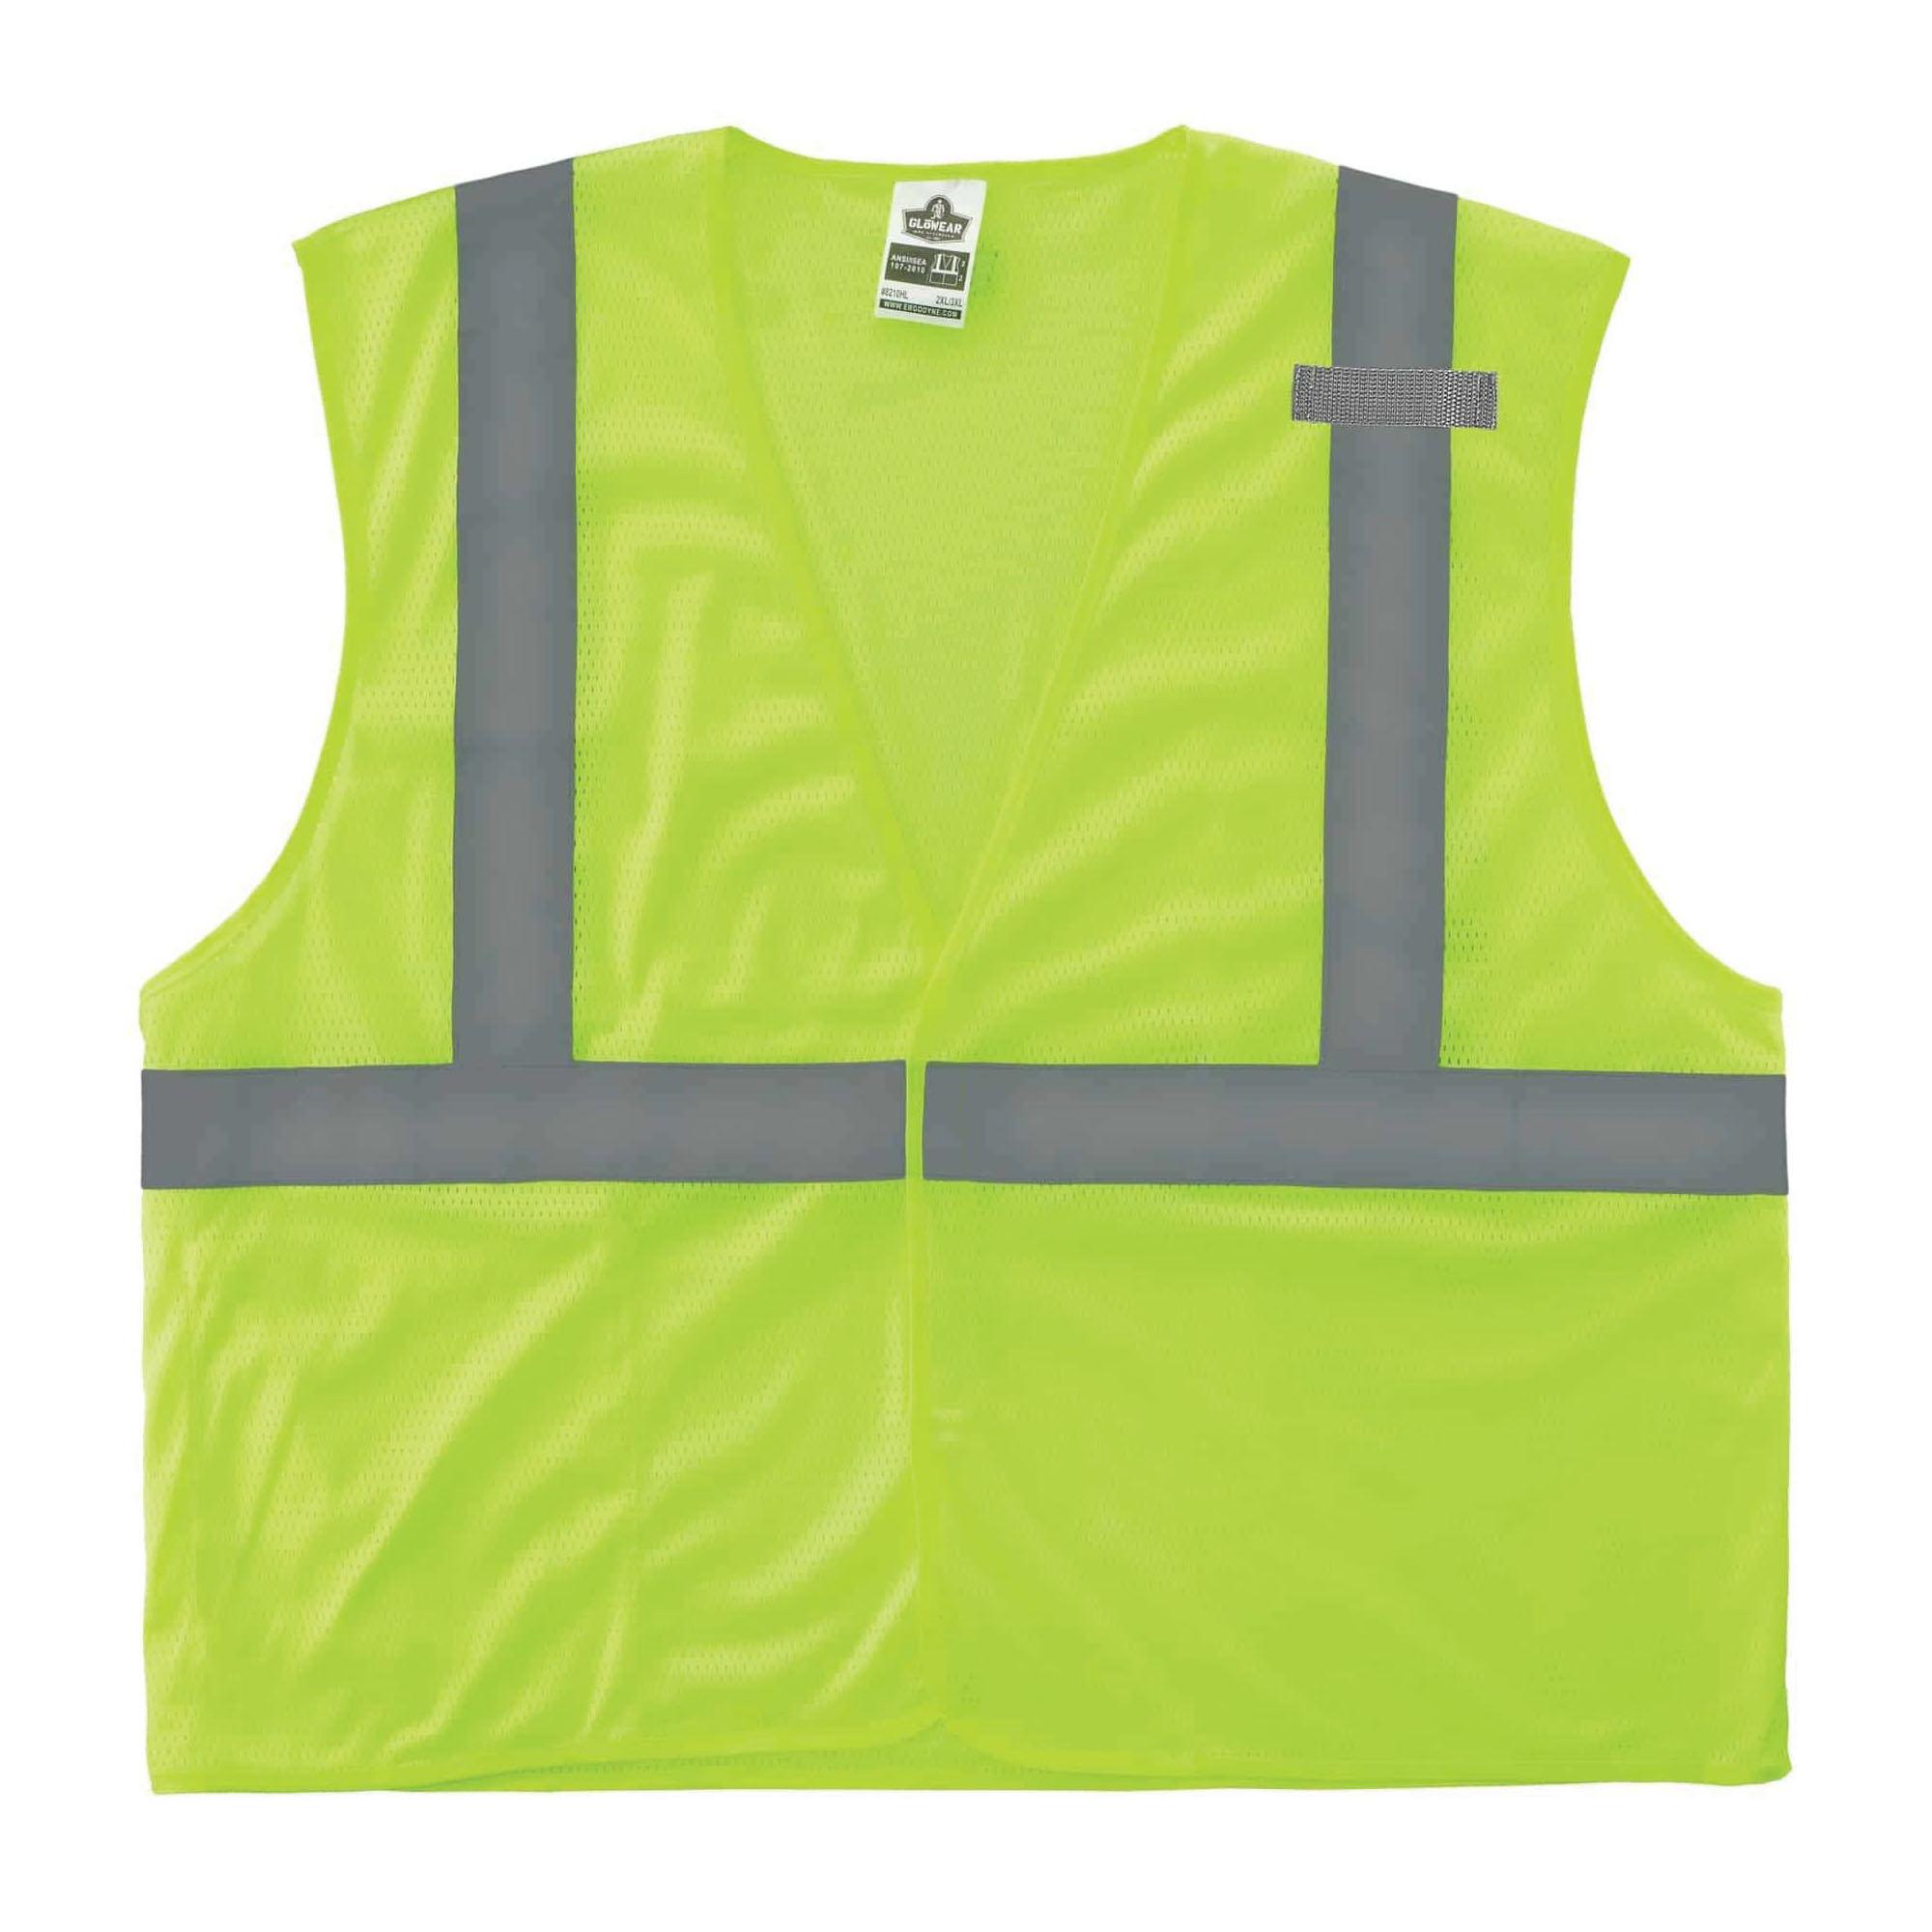 GloWear® 20995 8205Z Super Econo Vest, L to XL, Hi-Viz Lime, Polyester Mesh, Zipper Closure, ANSI Class: Class 2, ANSI/ISEA 107-2015 Type R